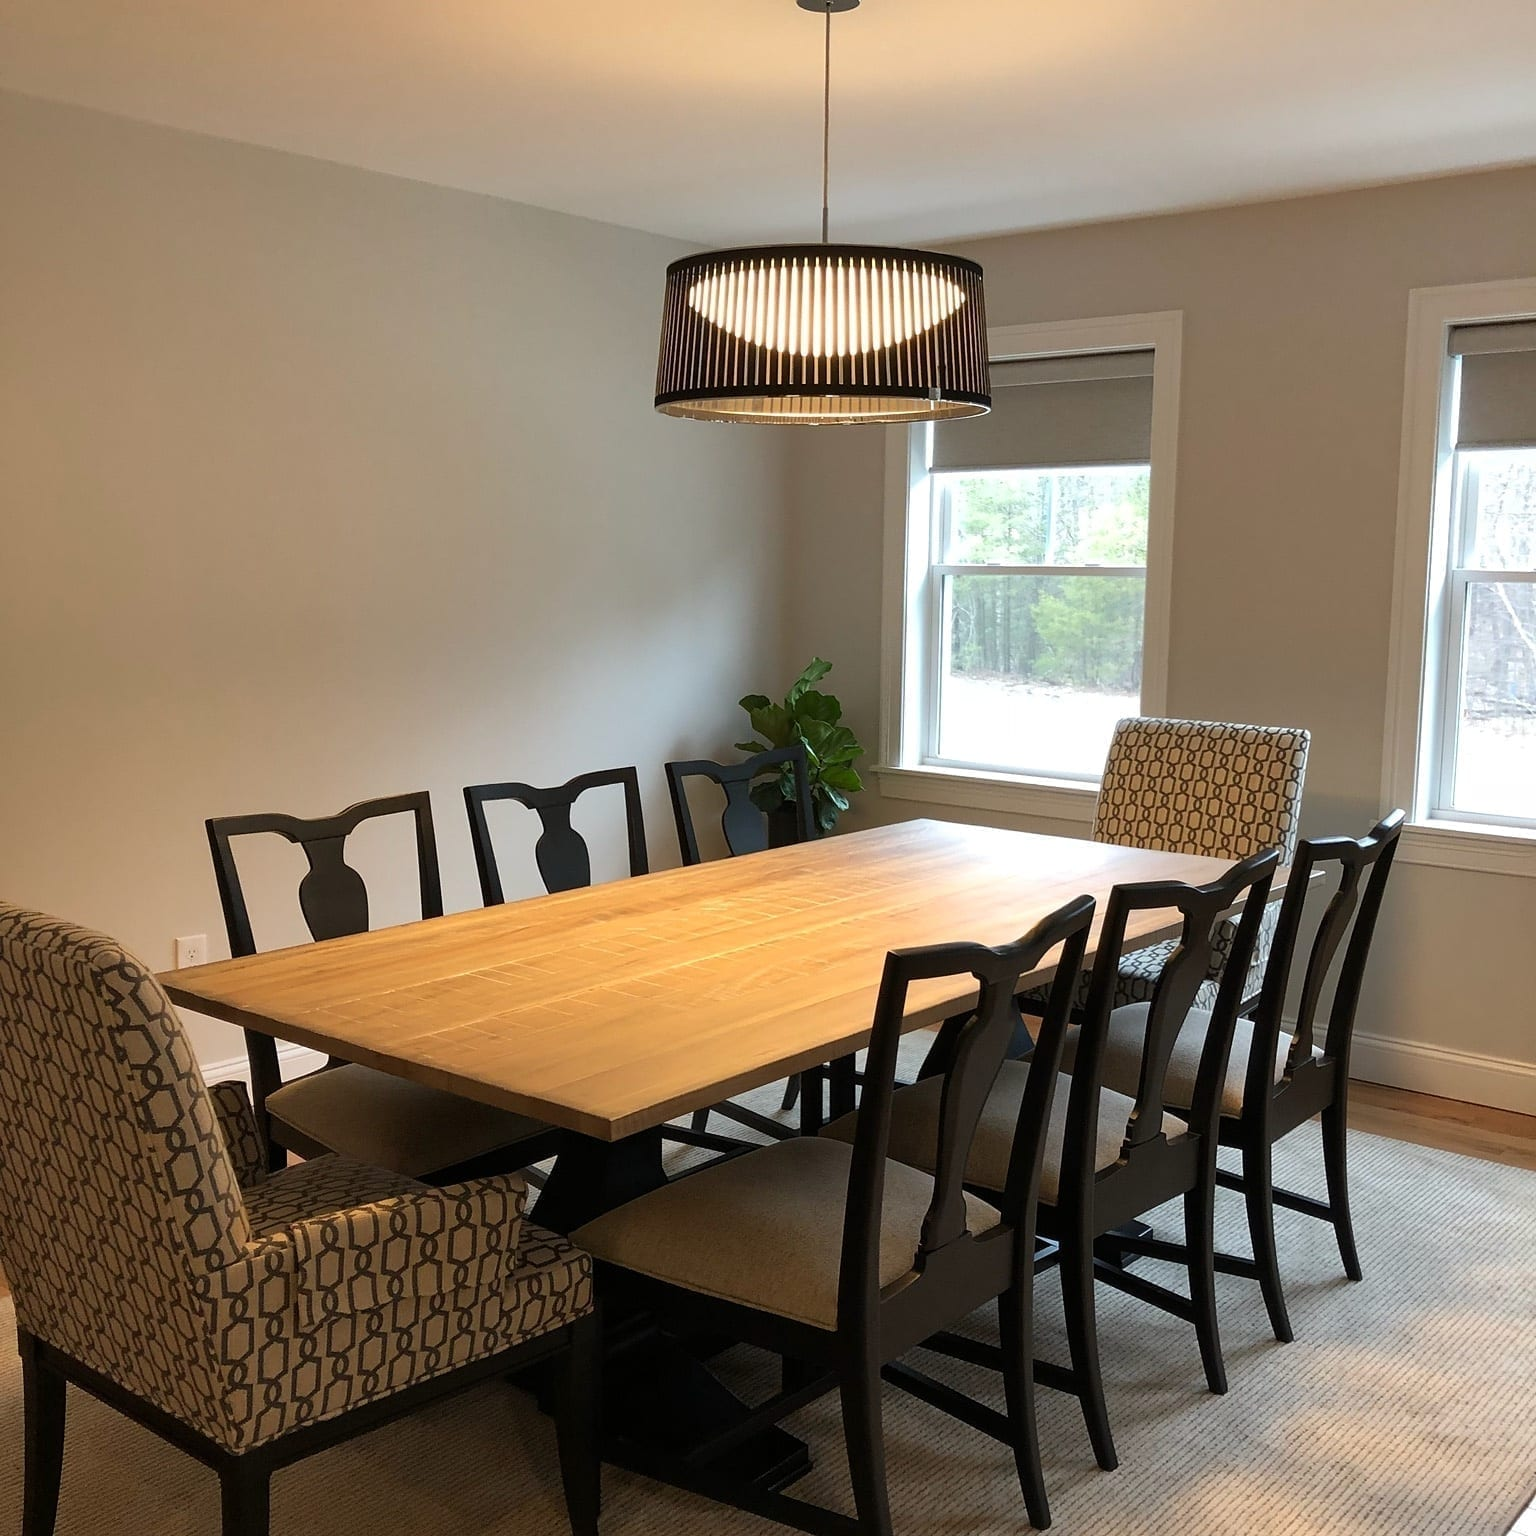 Decorative Custom Lighting Fixture for Dining Room